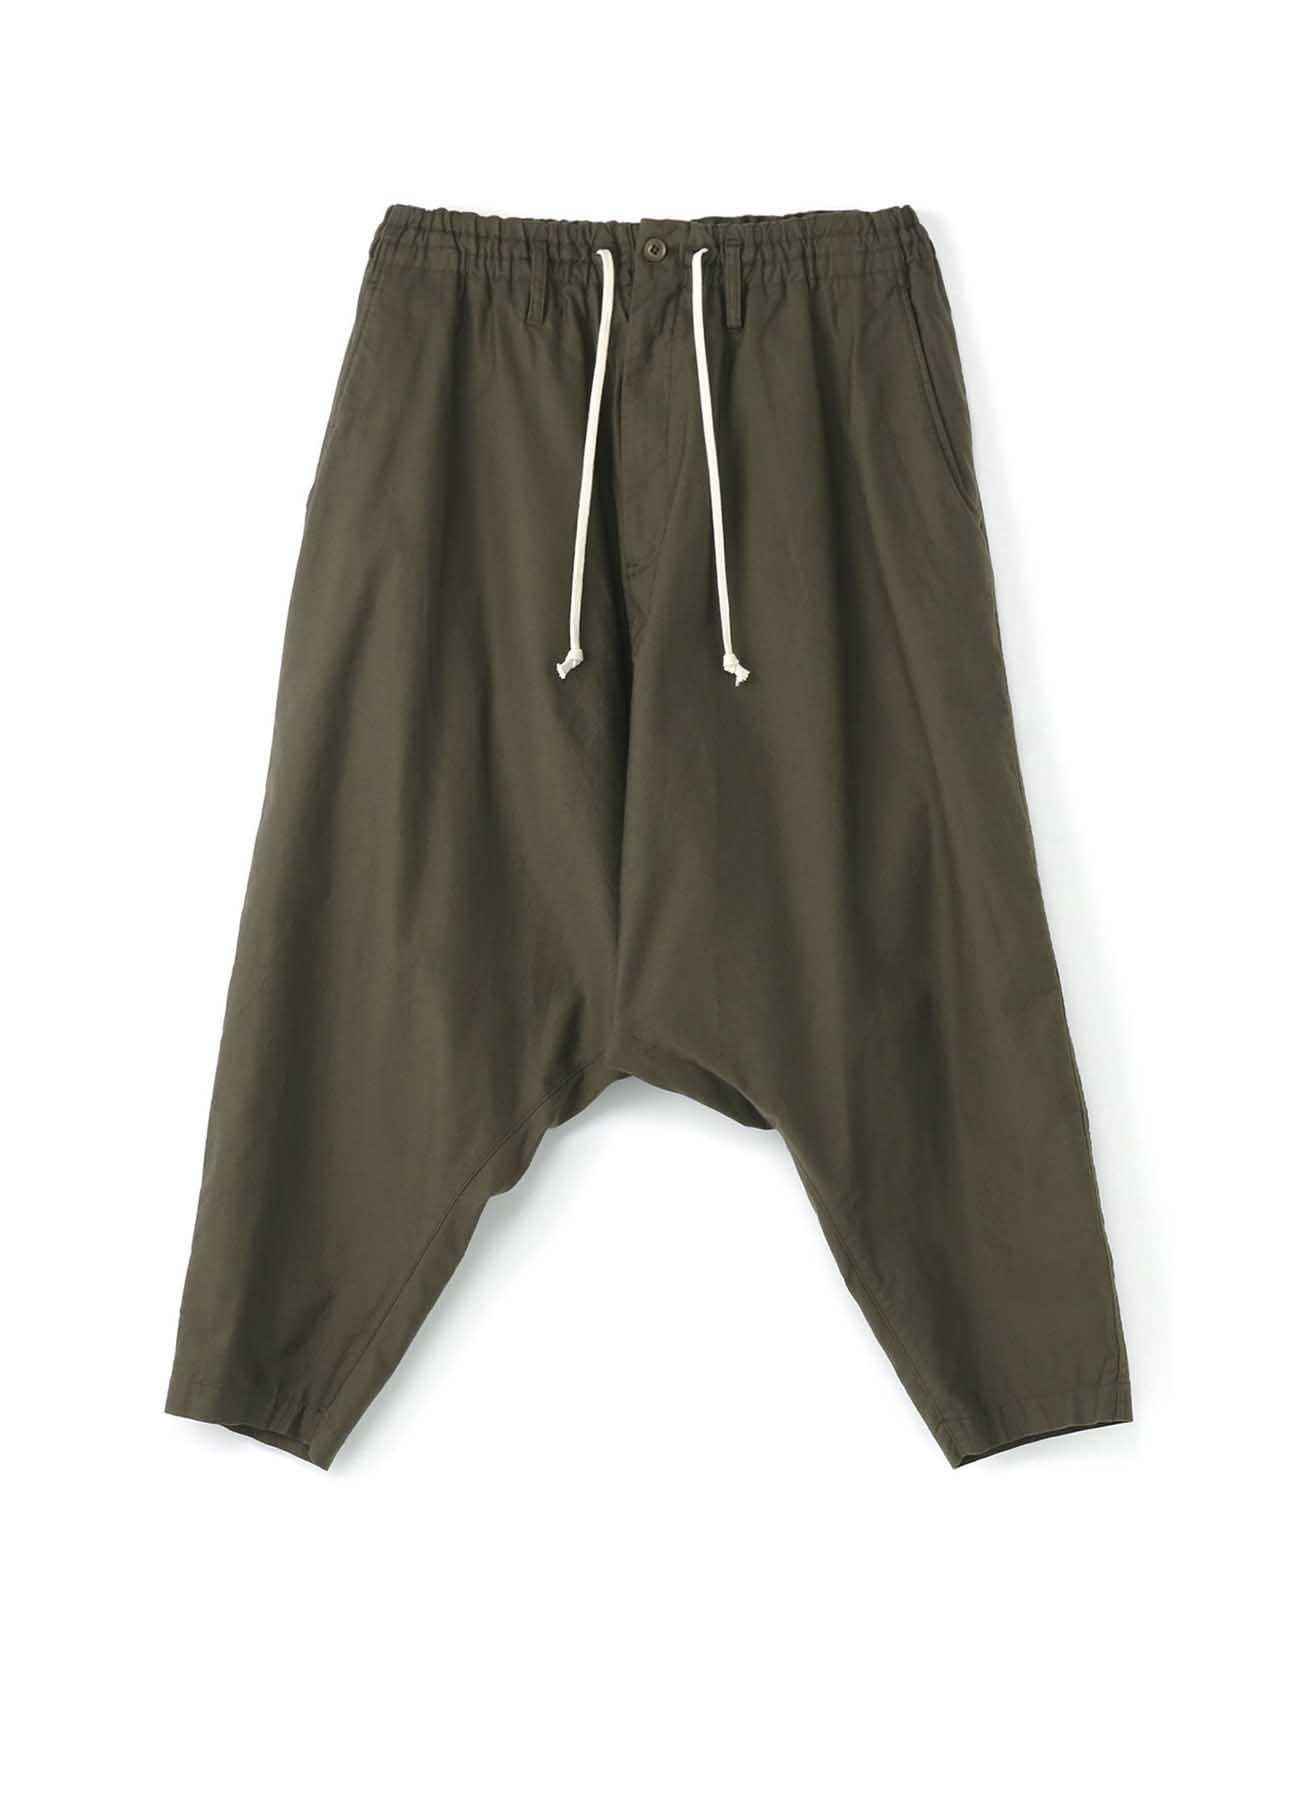 No.9 Sarouel Pants Cotton Twill - Thick